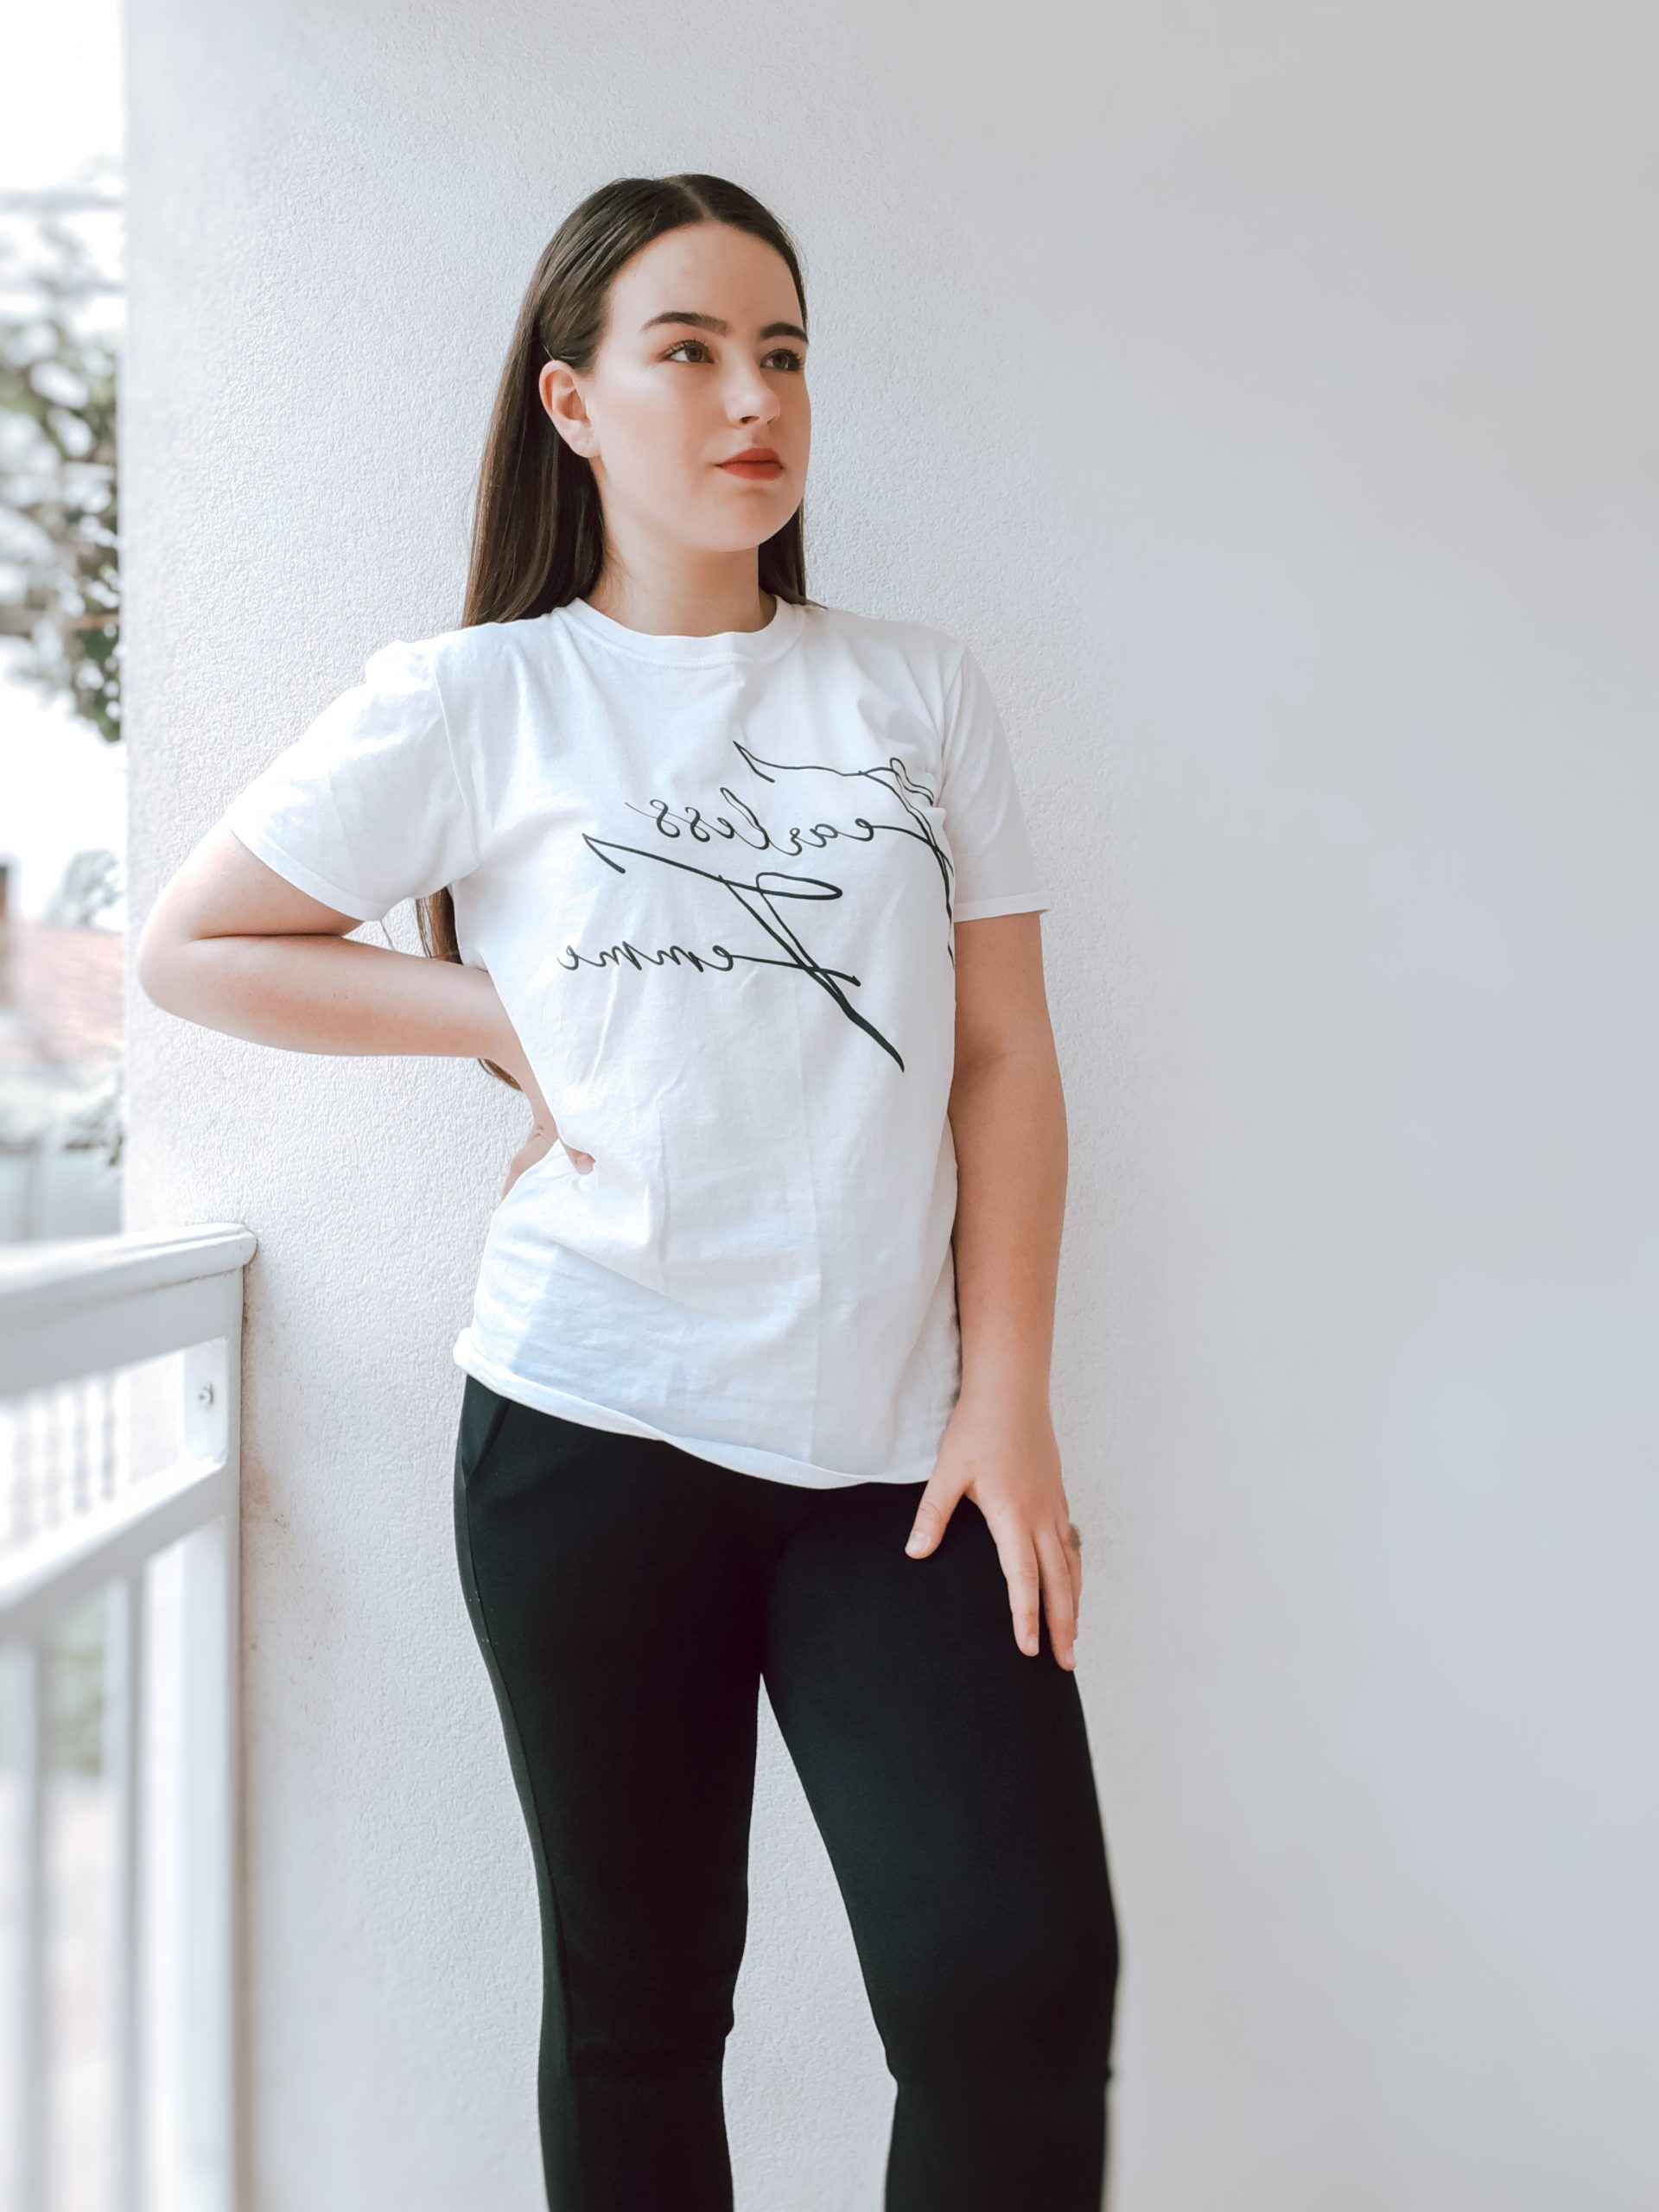 femme luxe try on haul femme luxe finery livinglikev fashion blogger fearless femme t shirt living like v